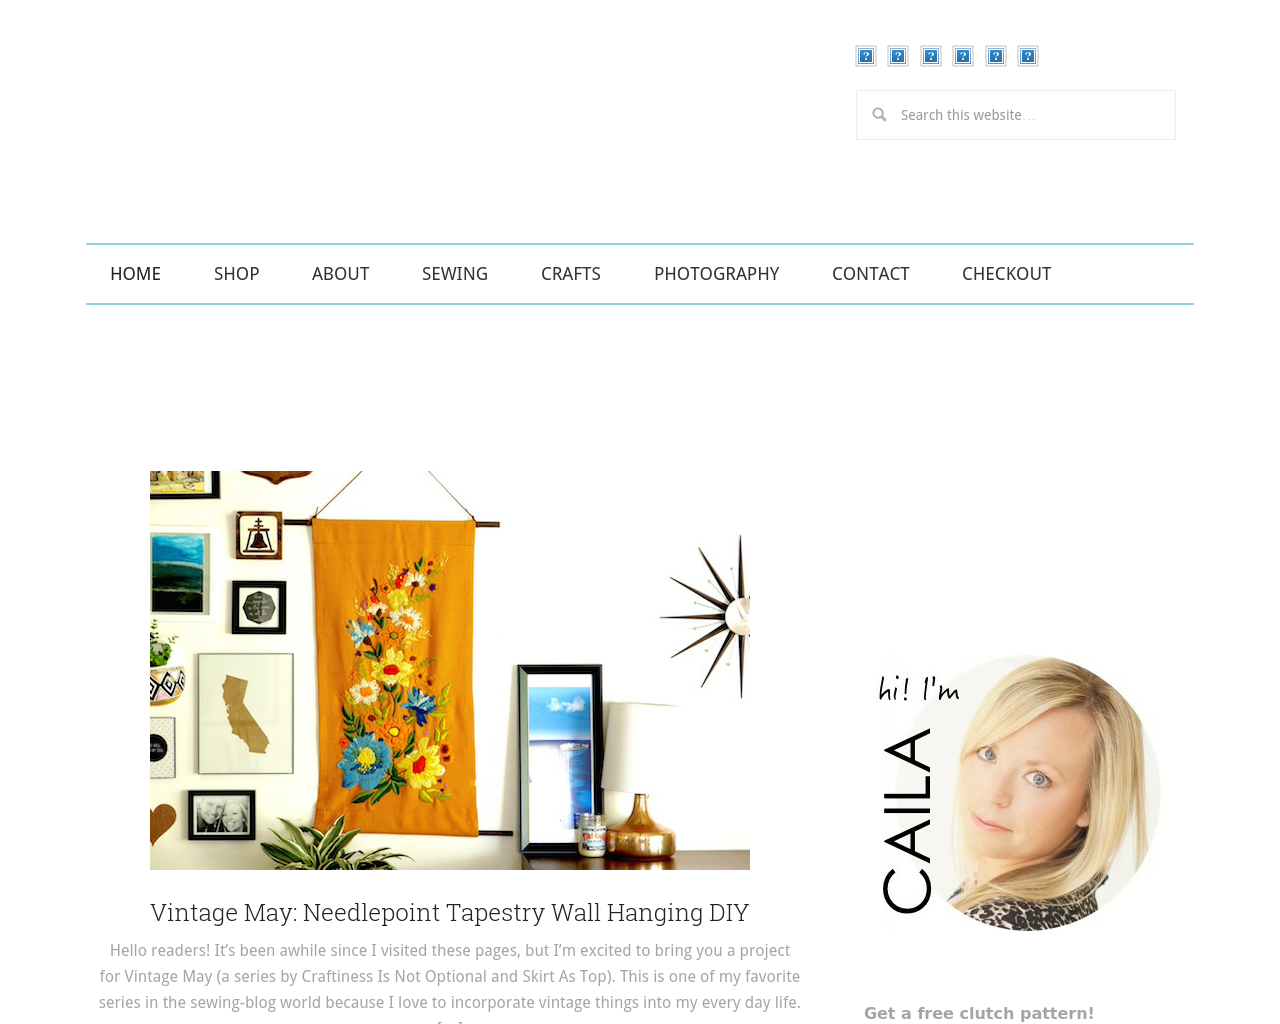 CailaMade-Advertising-Reviews-Pricing